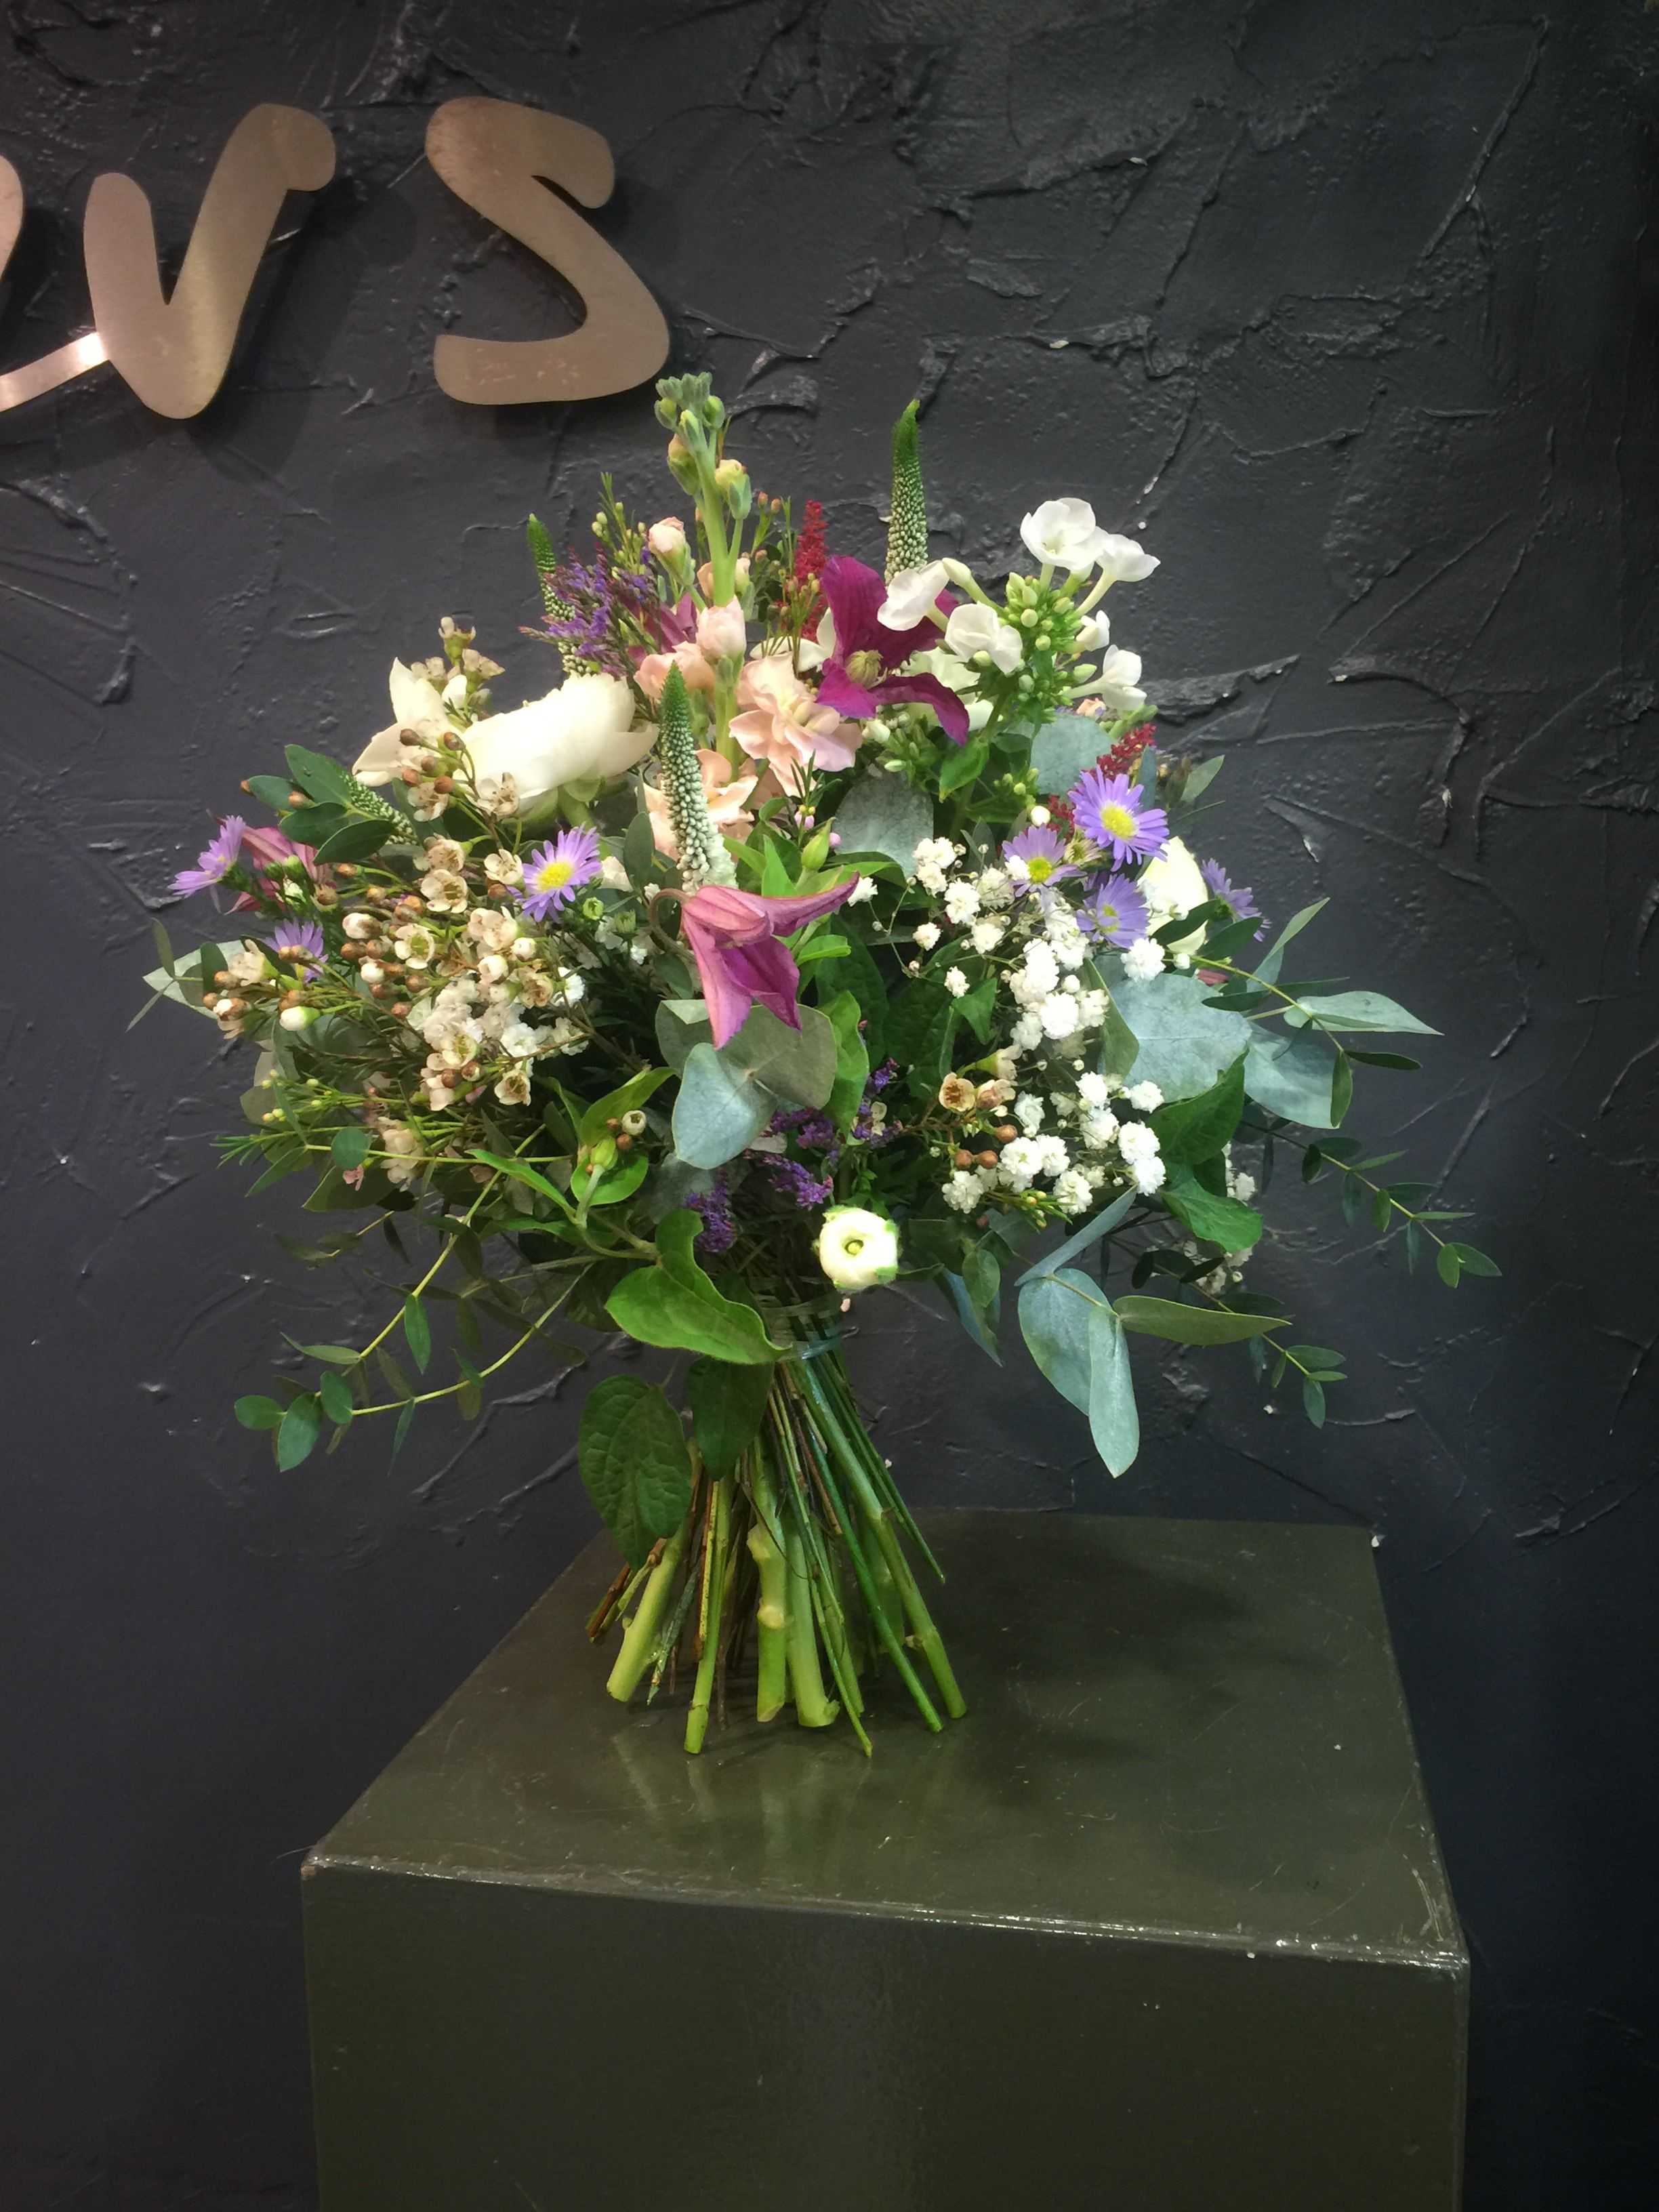 White ranunculus antique stock purple clematis white wax flower